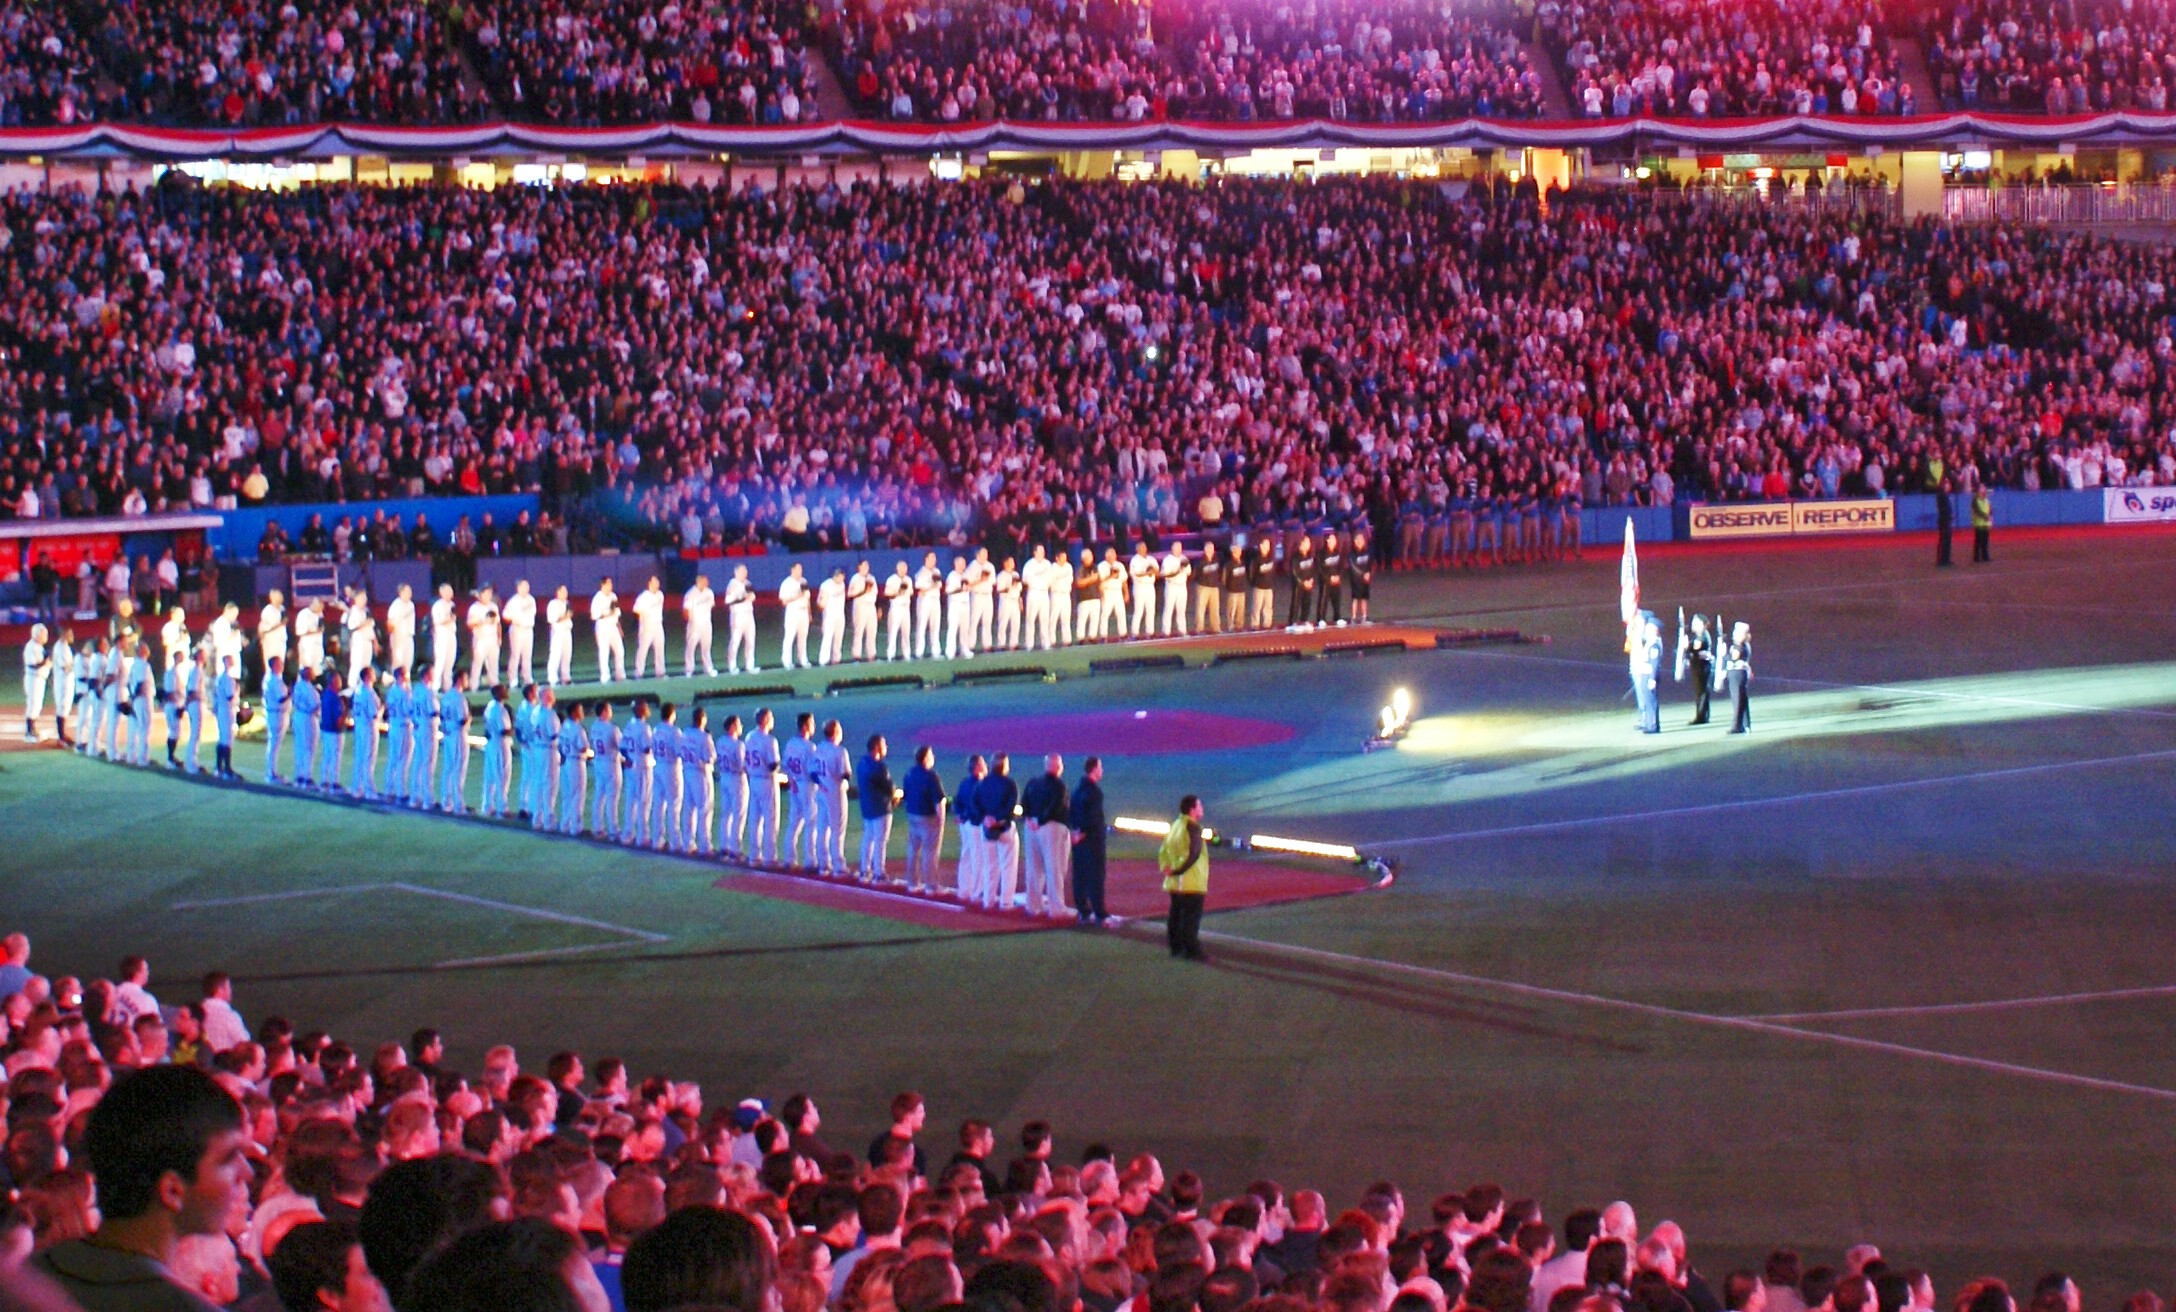 6369b1c36f8feb 2009 Toronto Blue Jays season - Wikipedia